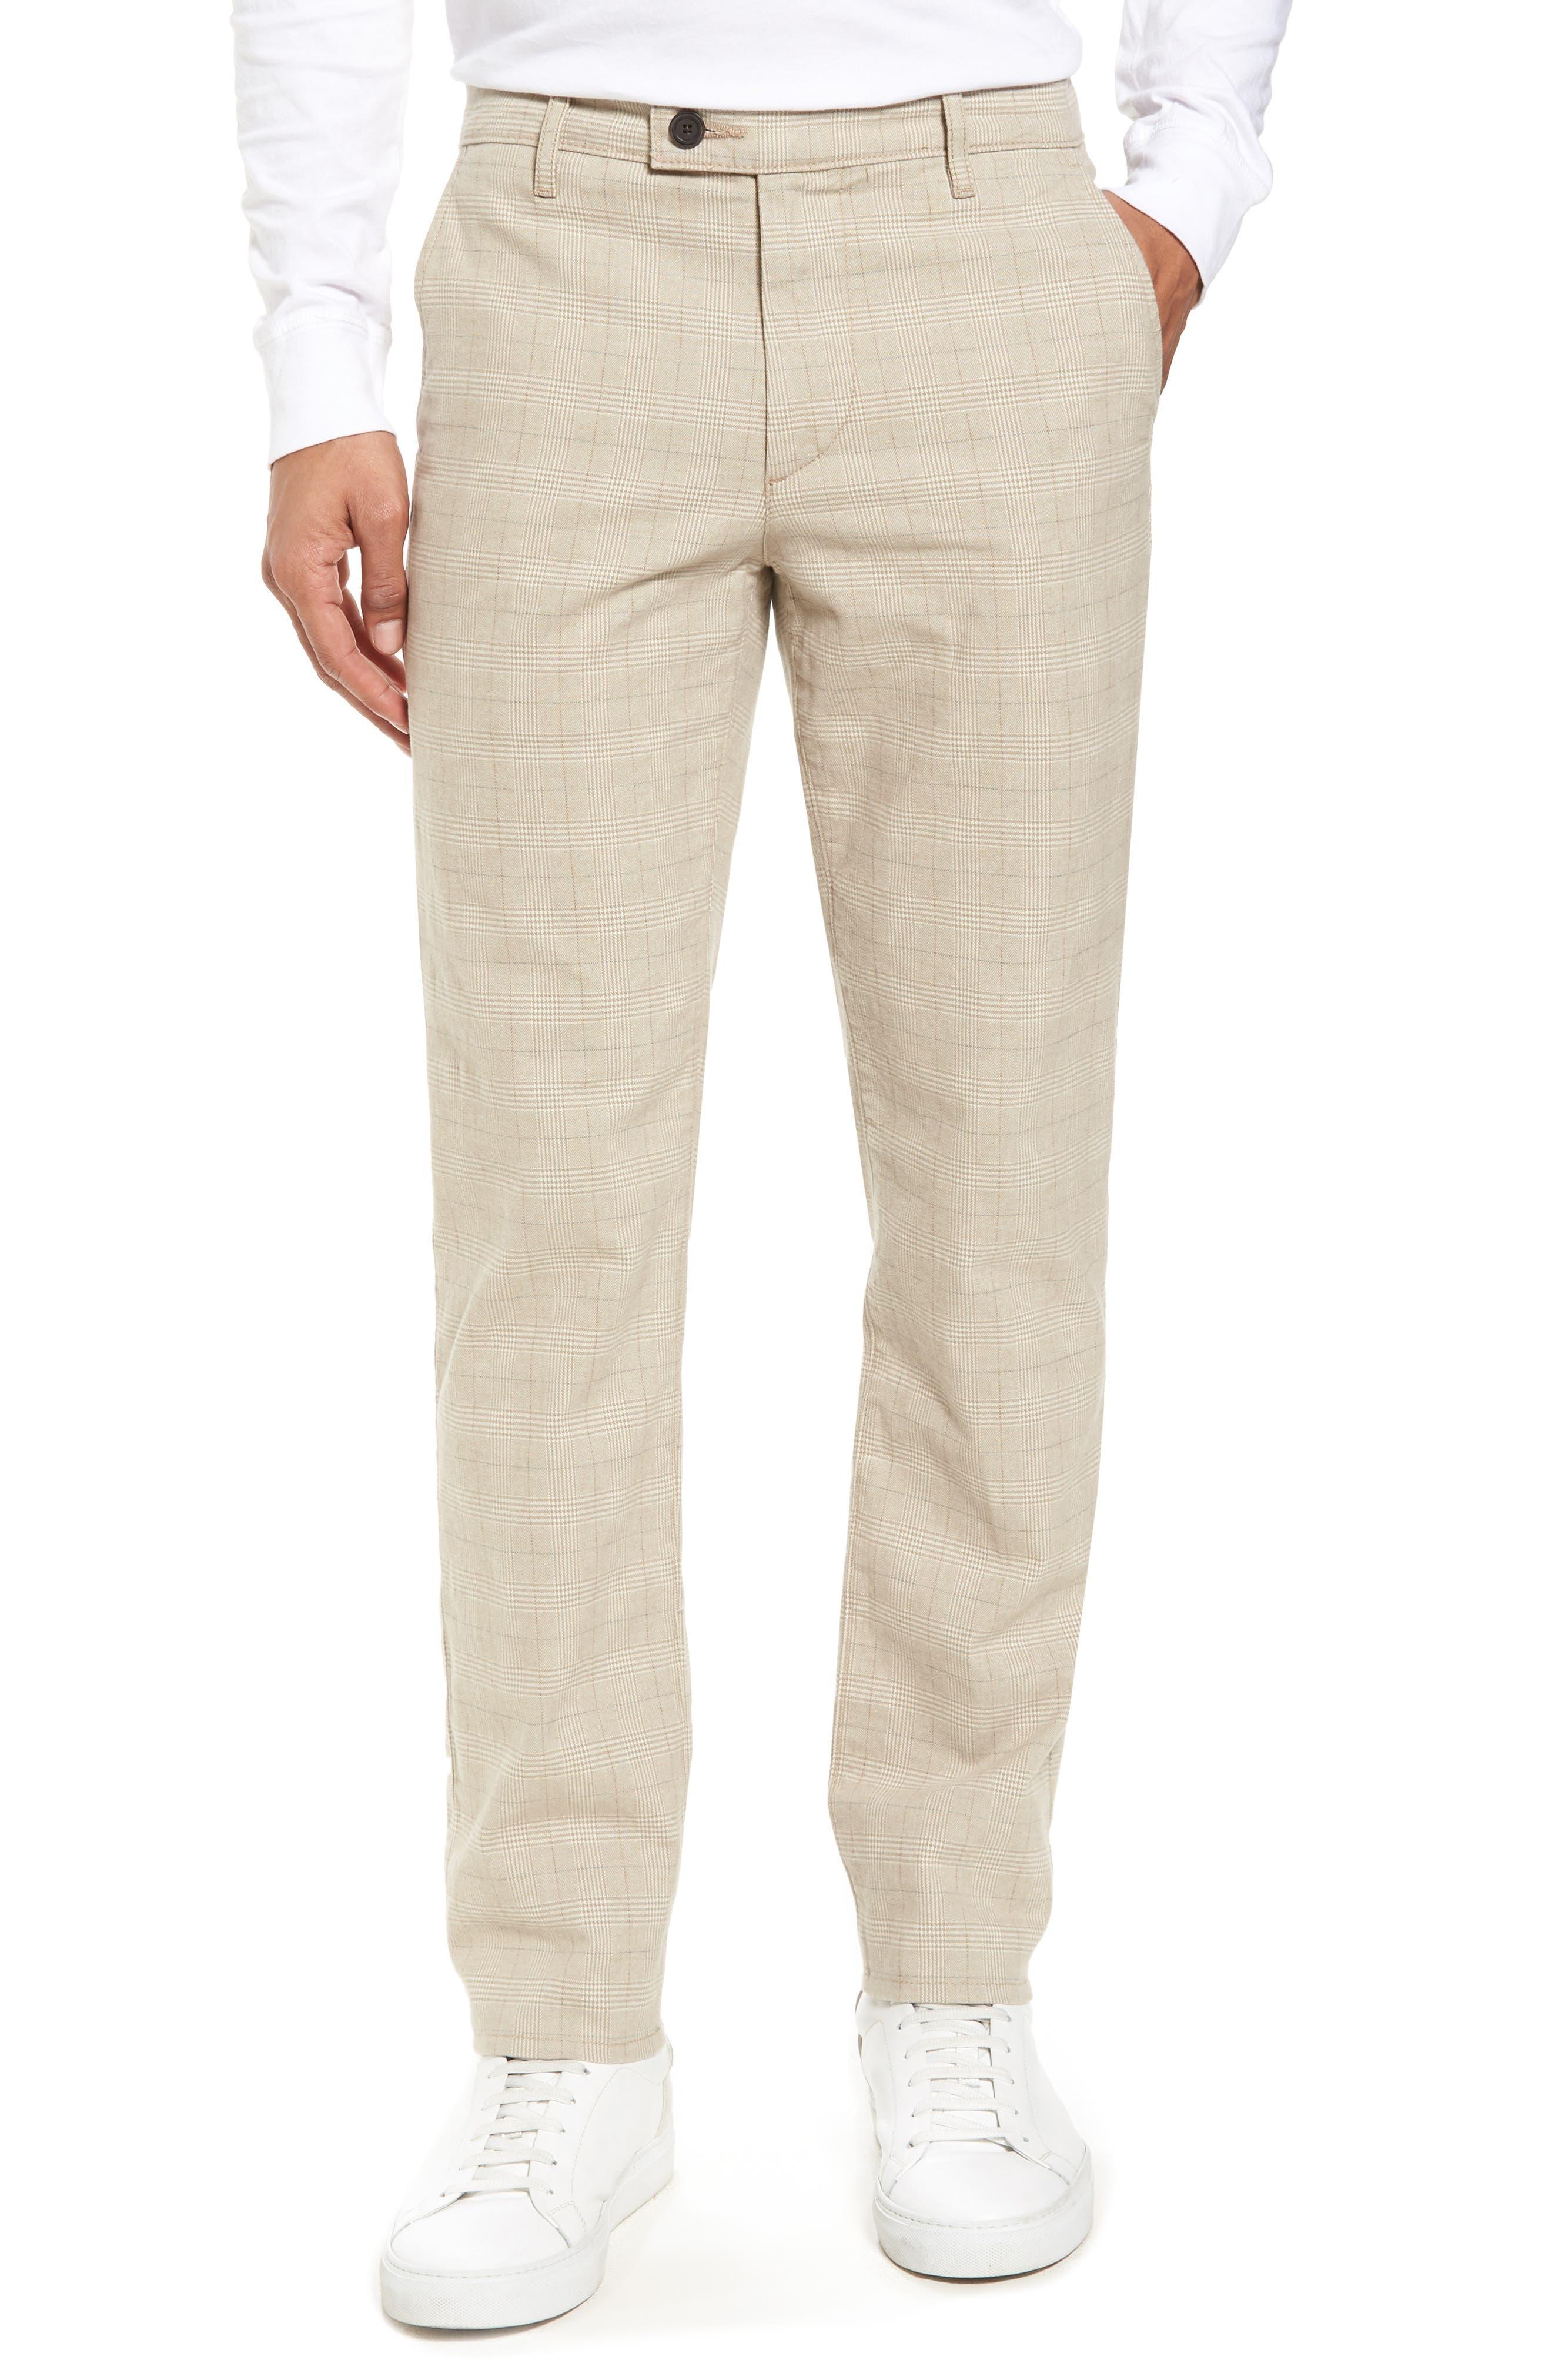 Marshall Slim Fit Pants,                             Main thumbnail 1, color,                             Silica Sand